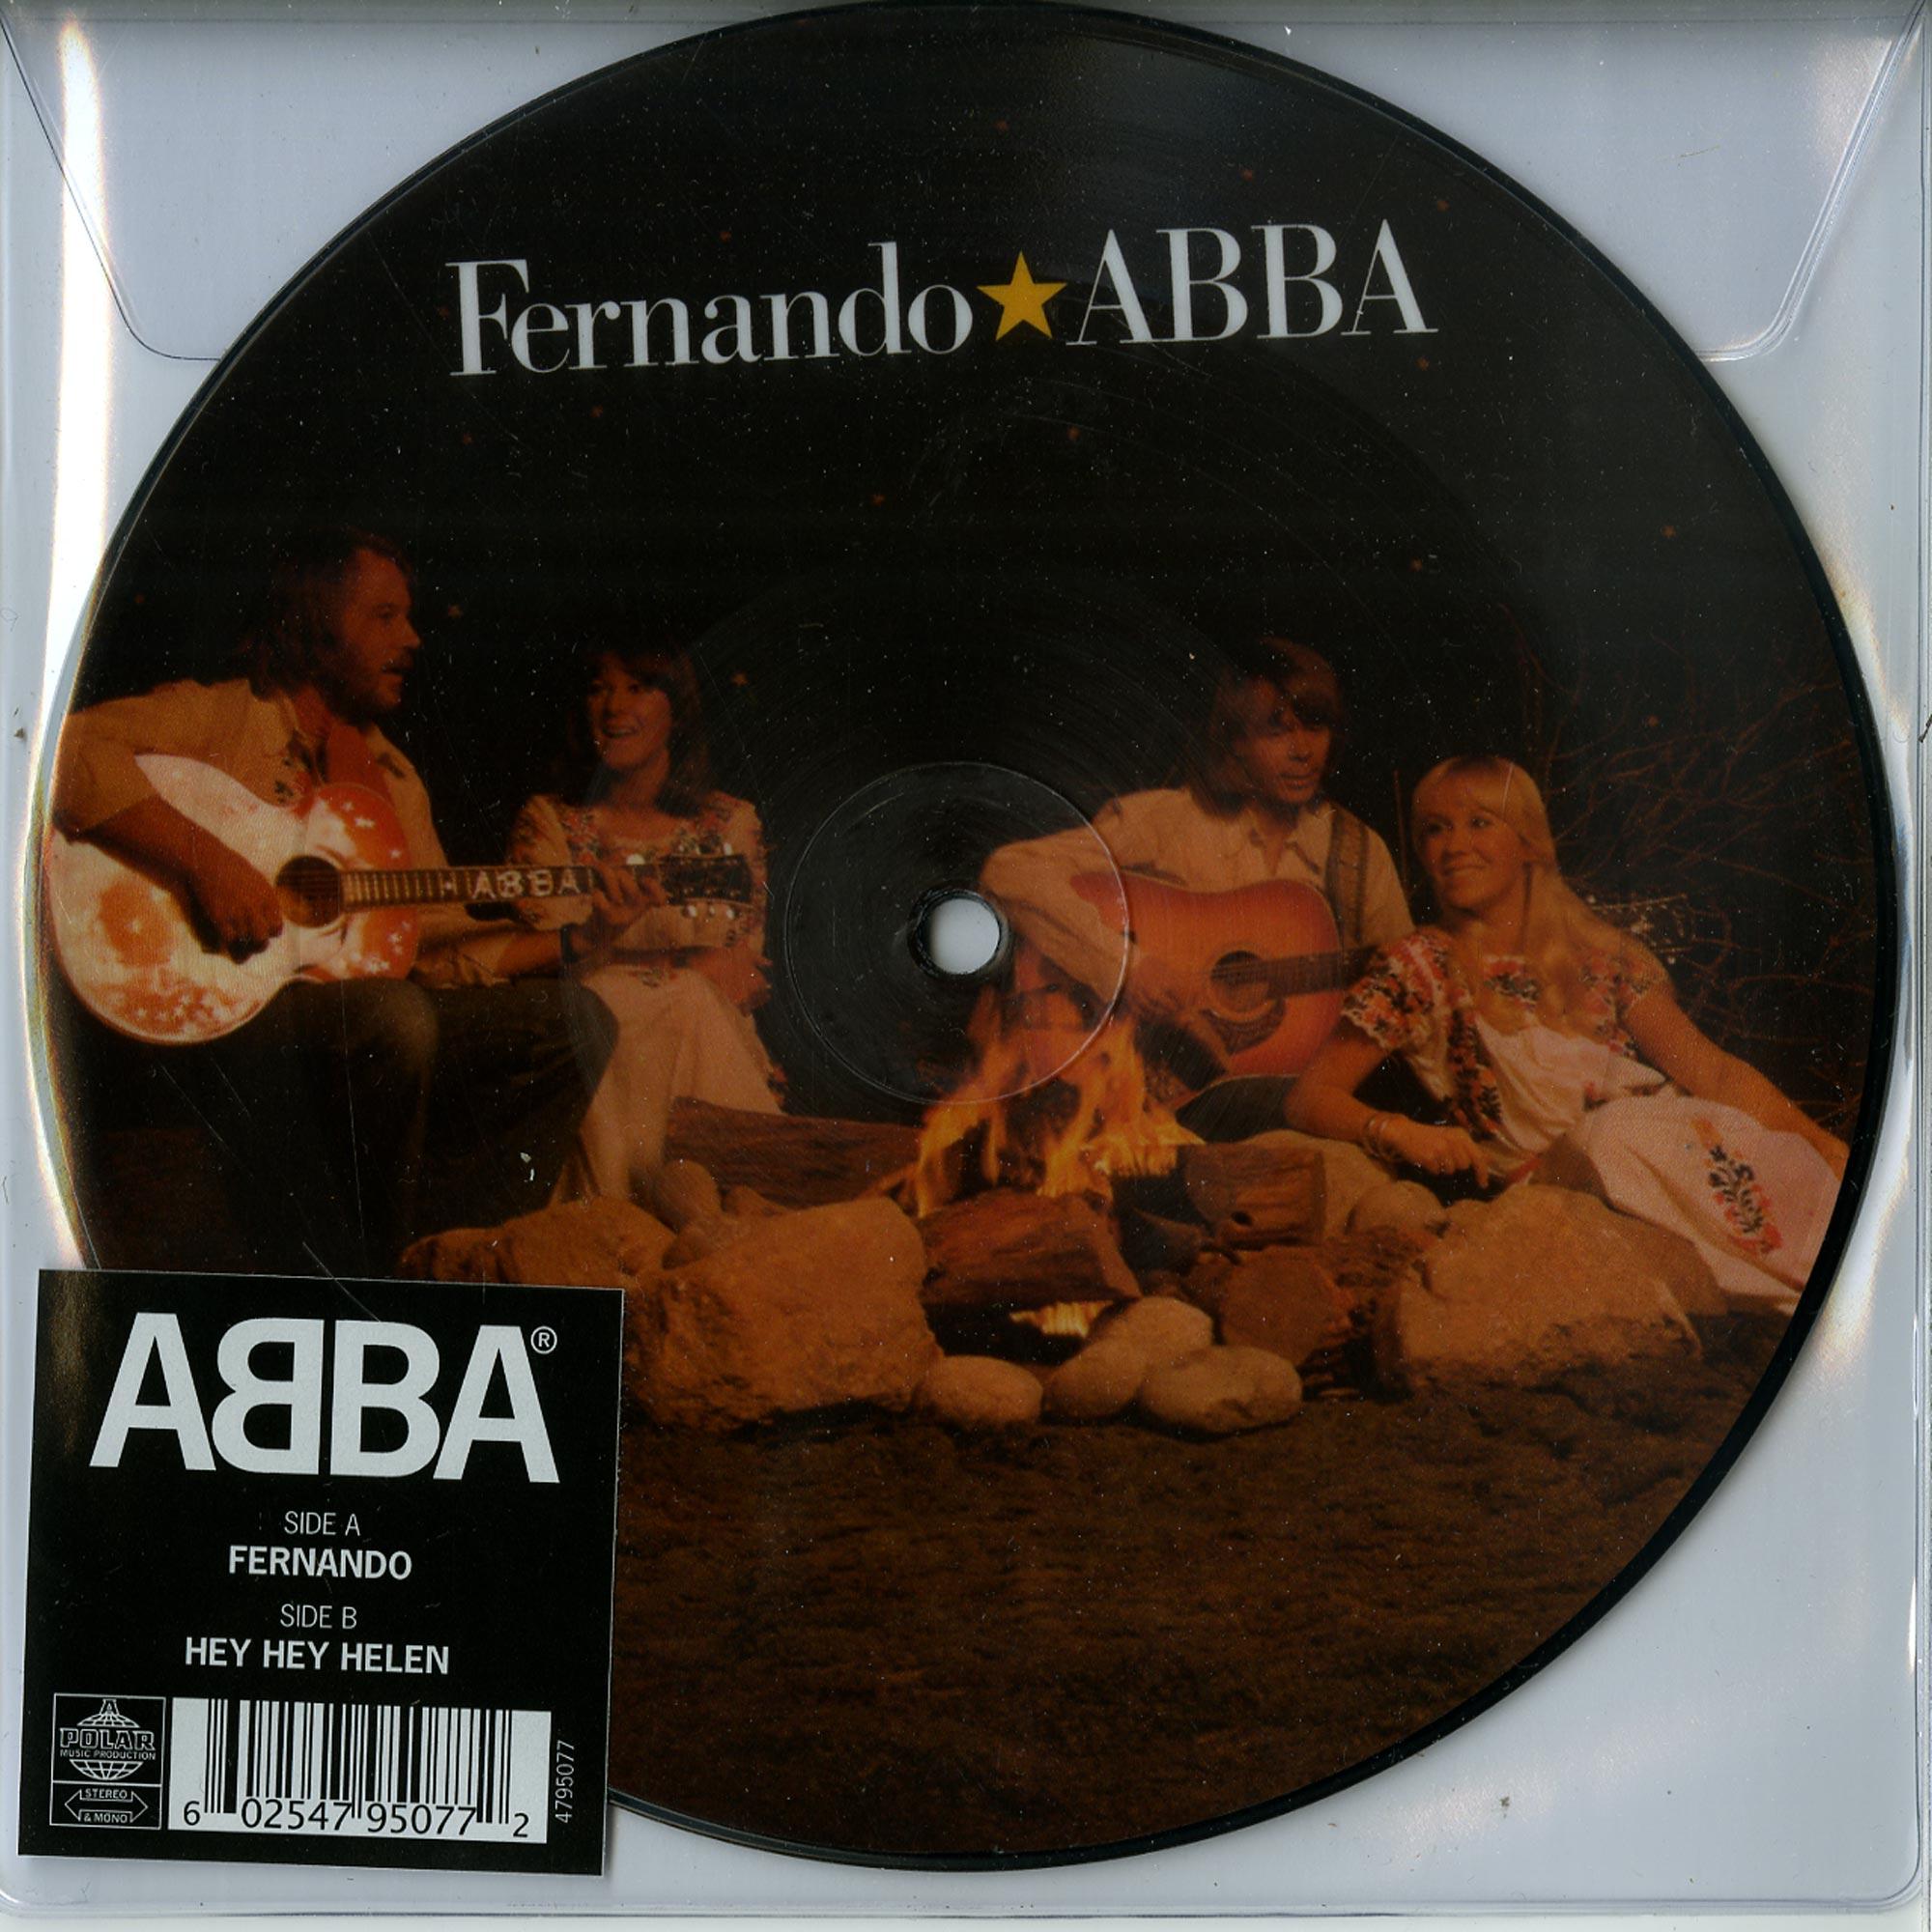 Abba - FERNANDO / HEY HEY HELEN